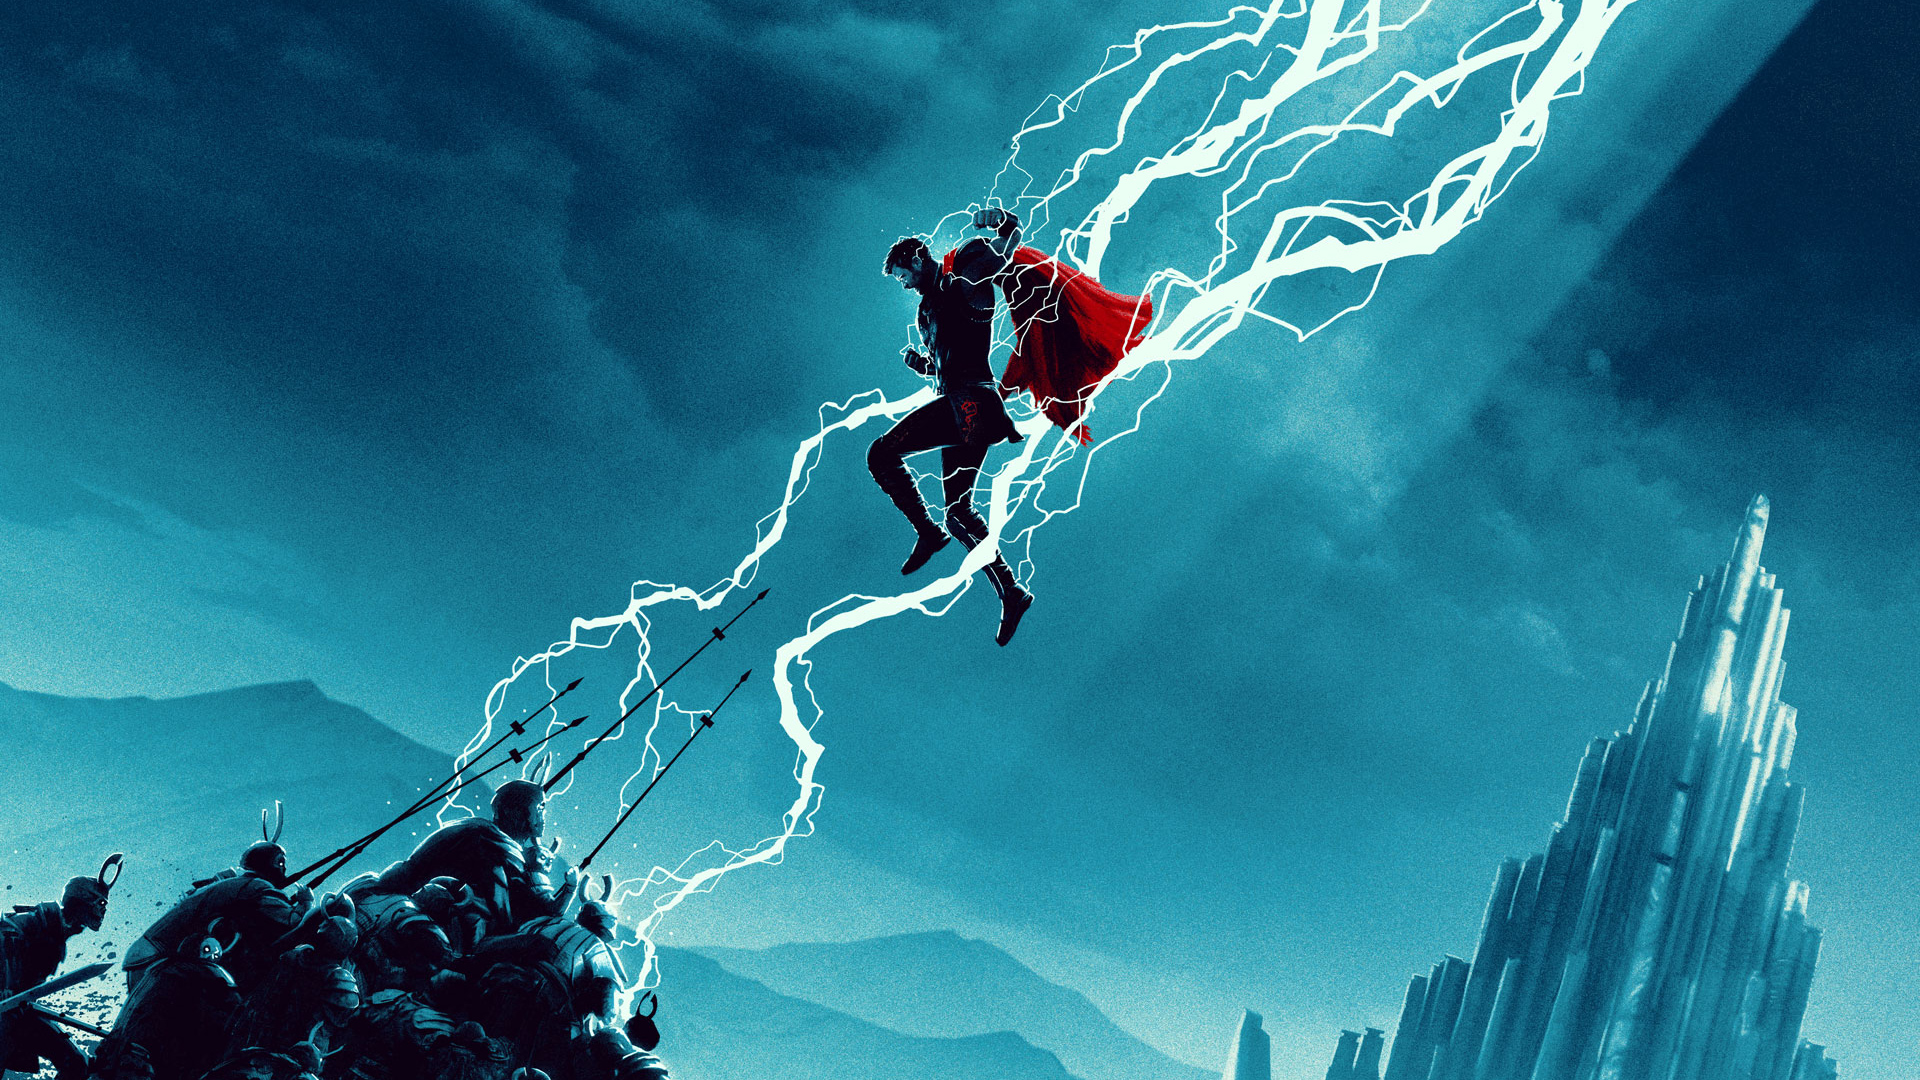 Thor ragnarok movie artwork 2018 hd superheroes 4k - Thor art wallpaper ...